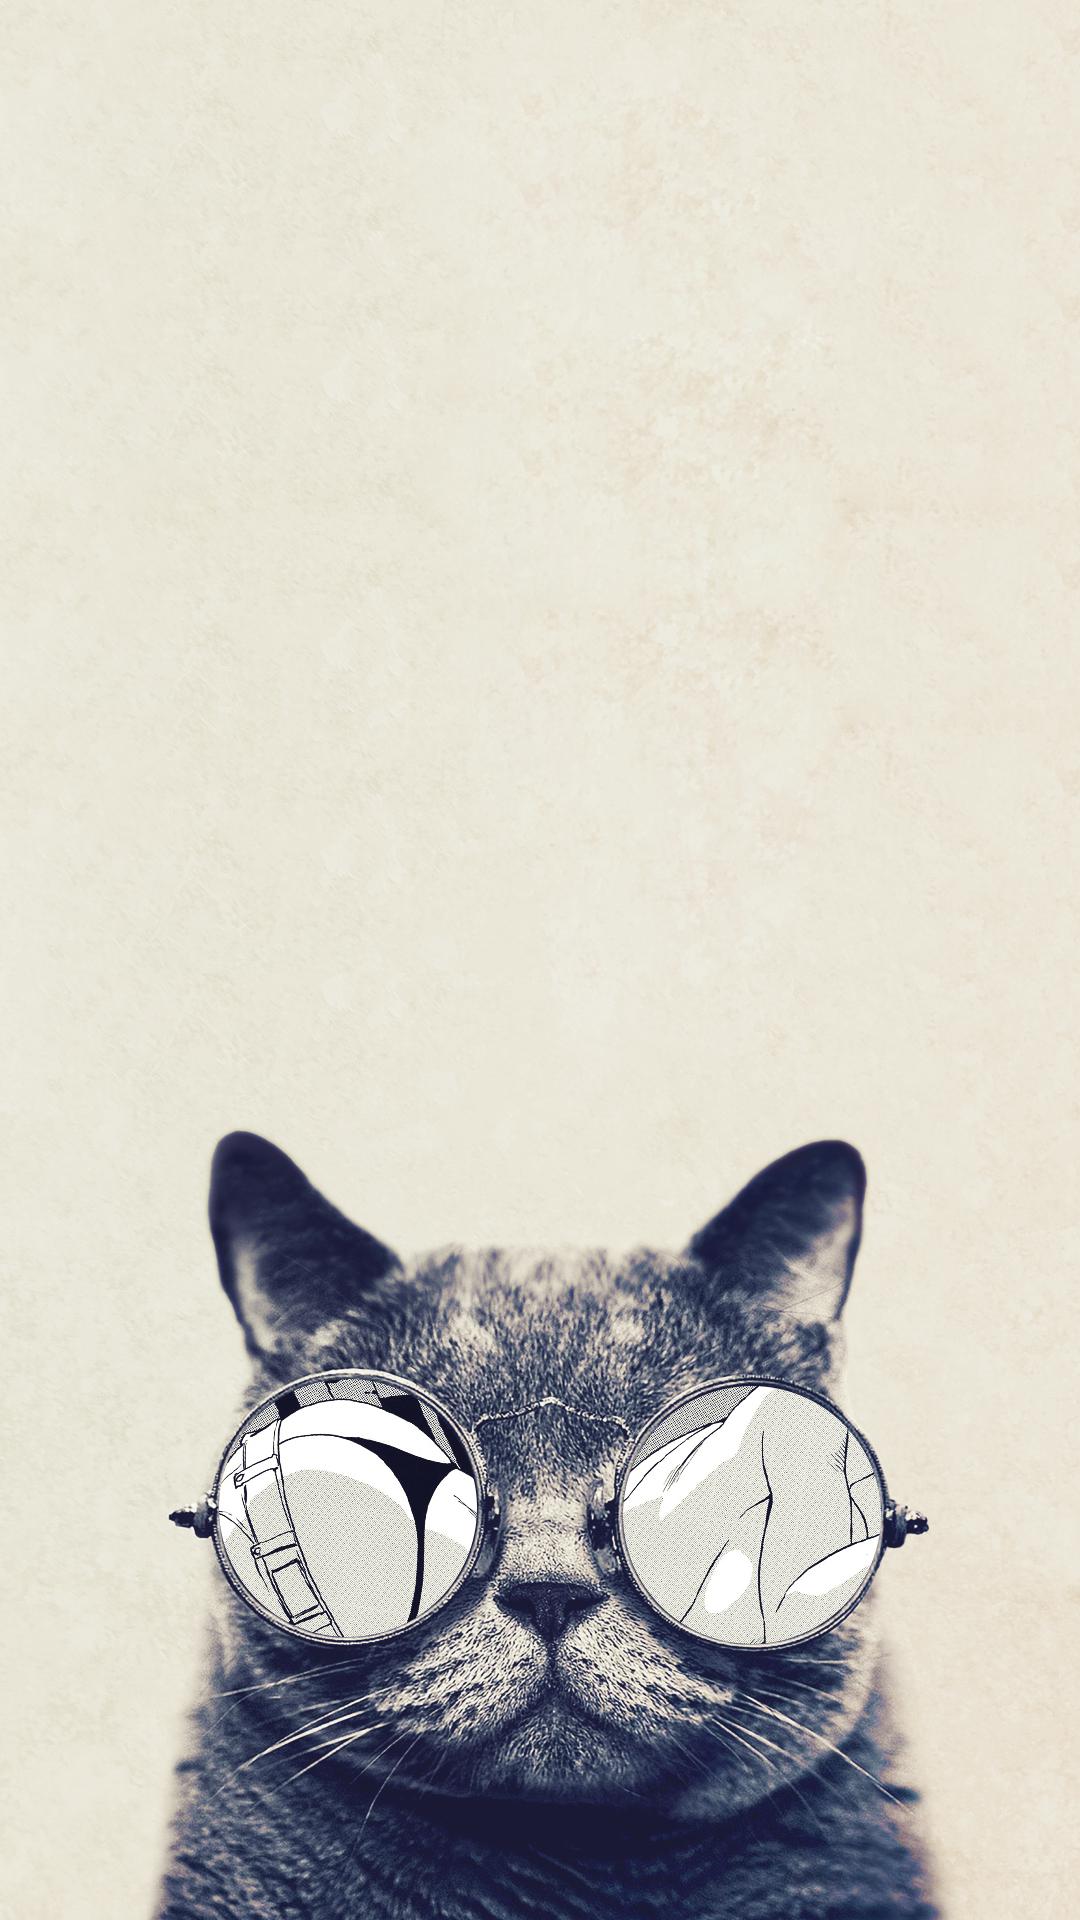 Cat glasses HTC hd wallpaper